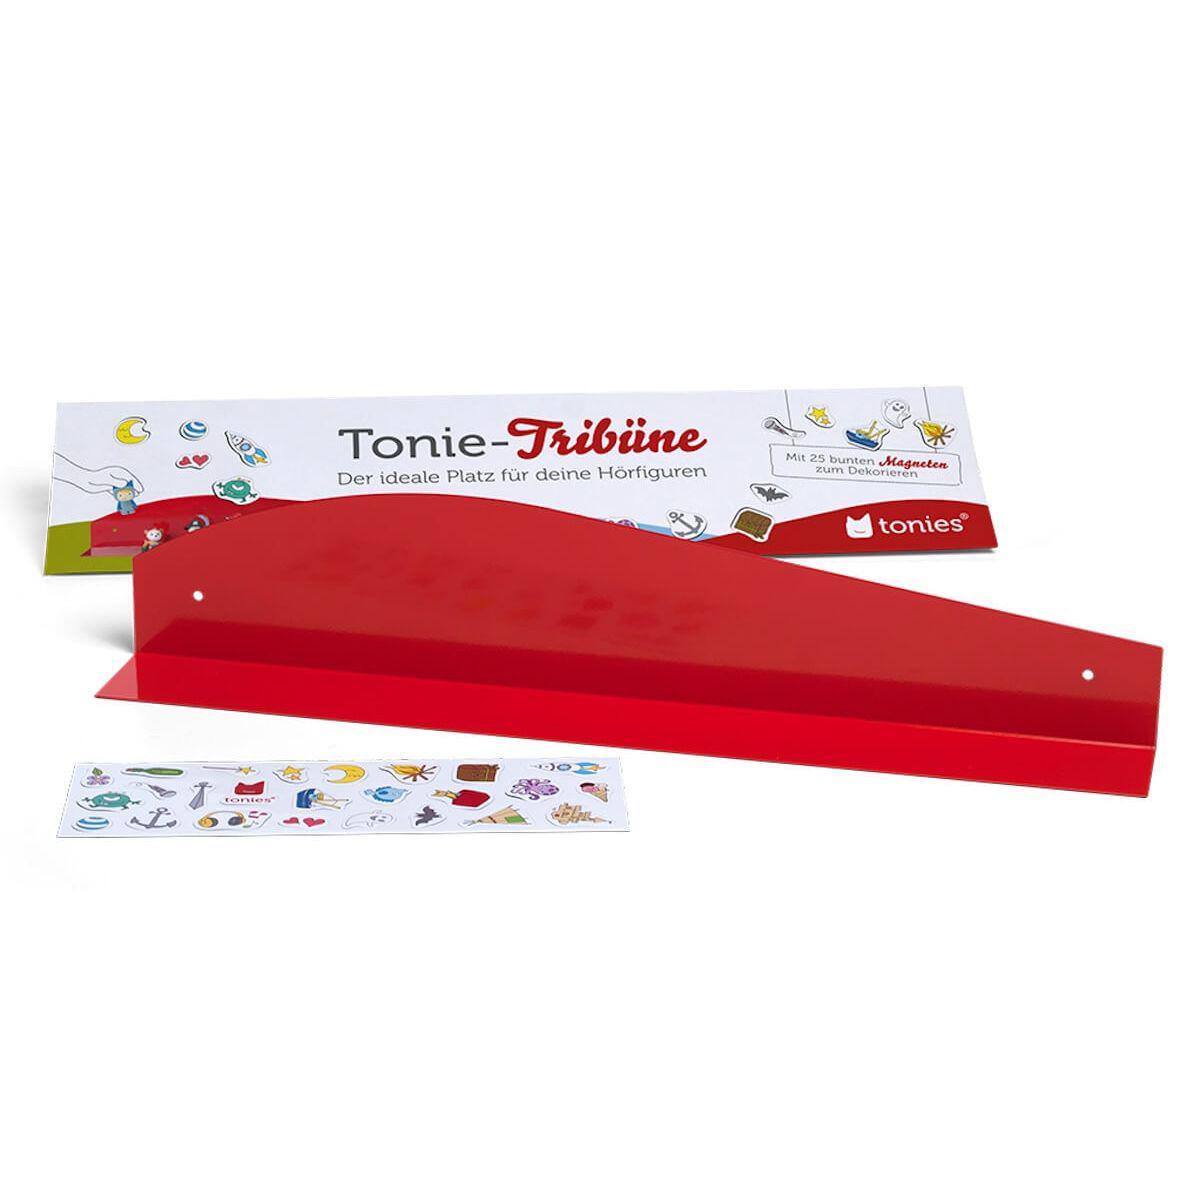 Hörspielfigur TONIES Tonie-Tribüne Rot